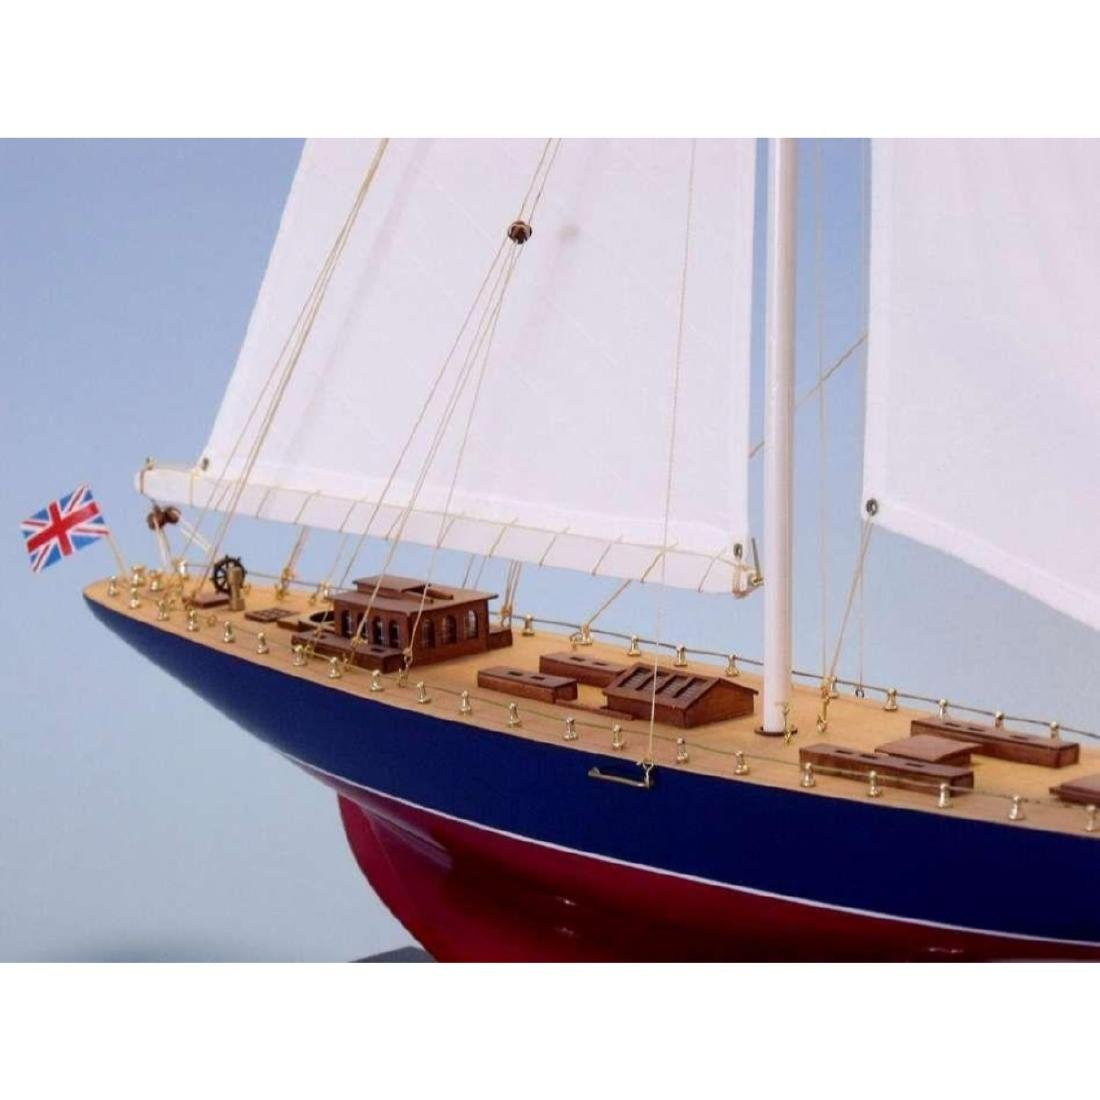 "Wooden Endeavour Limited Model Sailboat Decoration 35"" - 9"